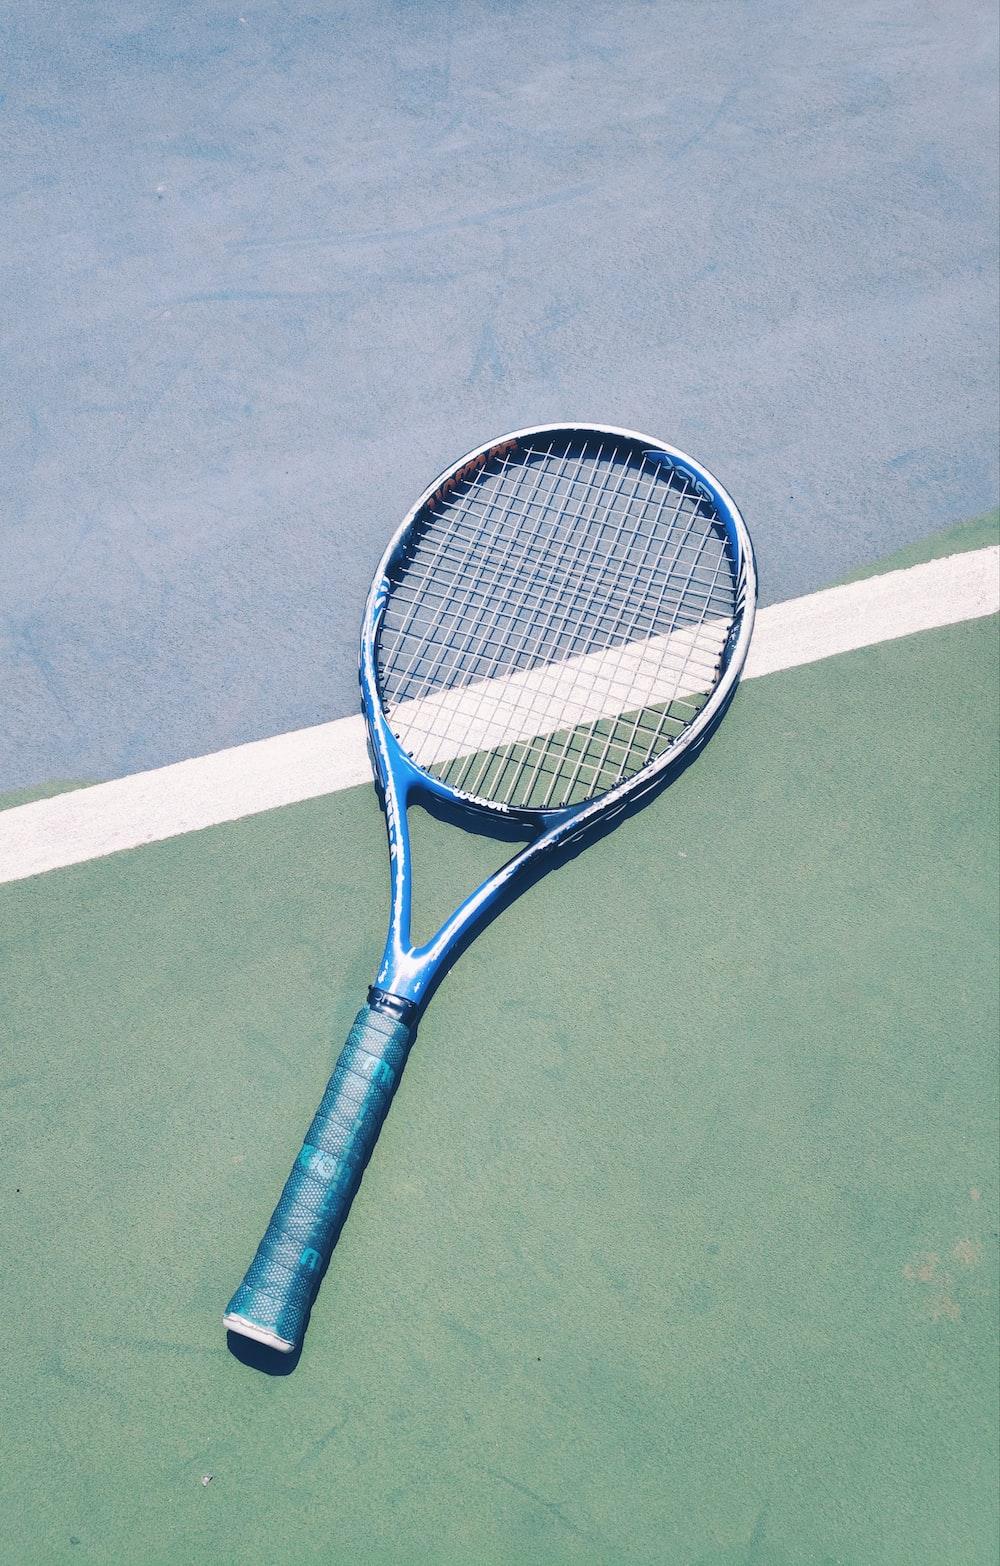 blue tennis racket on green surface